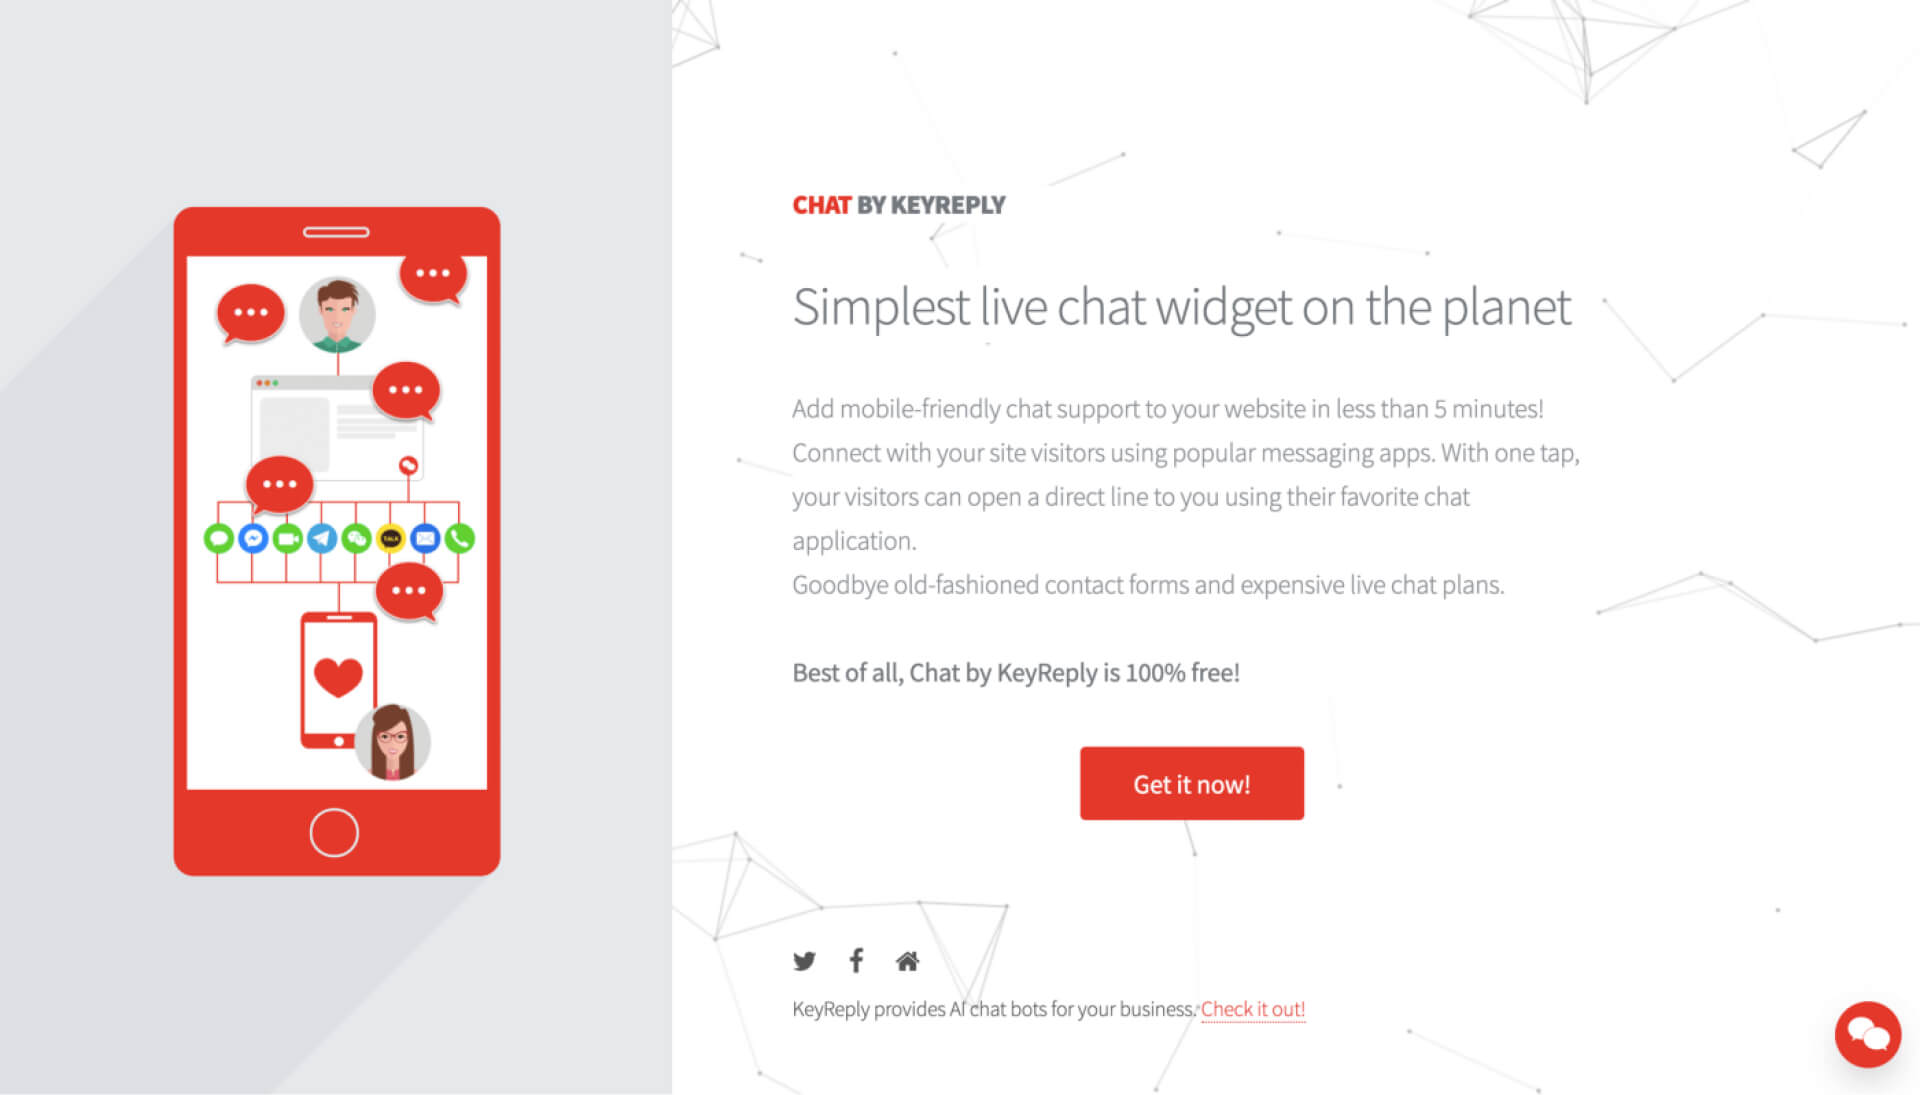 Chat by KeyReply 原本網頁還存在,現已消失-IrvingLab 爾文實驗室